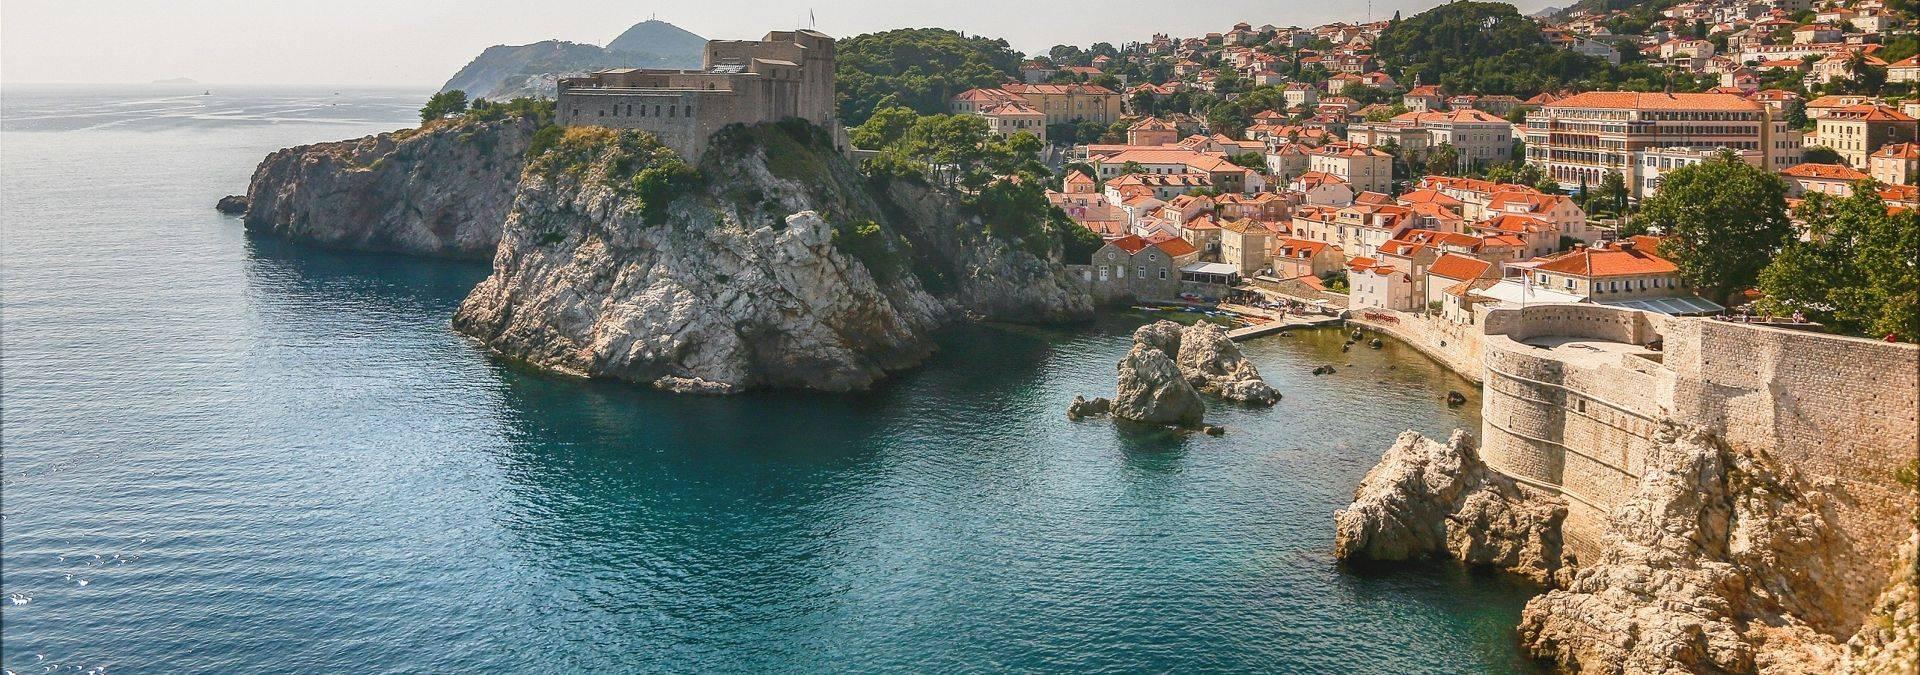 Dubrovnik Credit Ivo Biocina And Croatian National Tourist Board